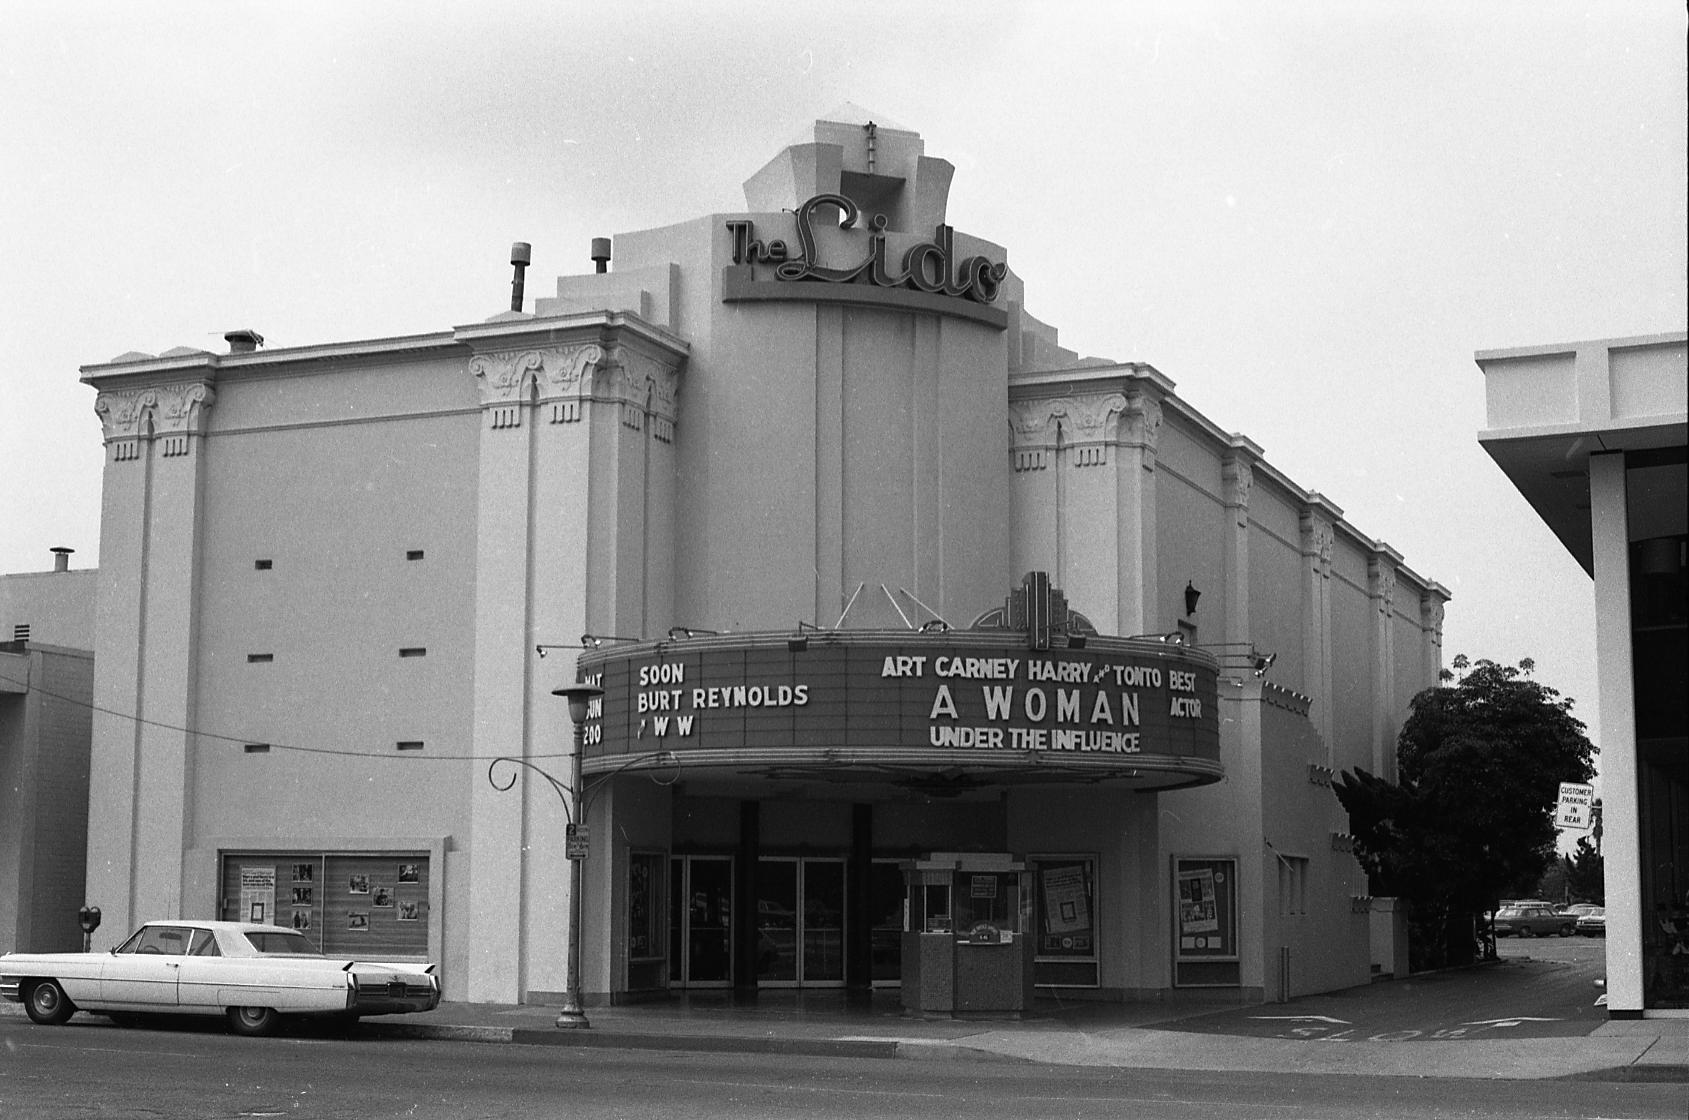 Regency Lido Theatre in Newport Beach, CA - Cinema Treasures